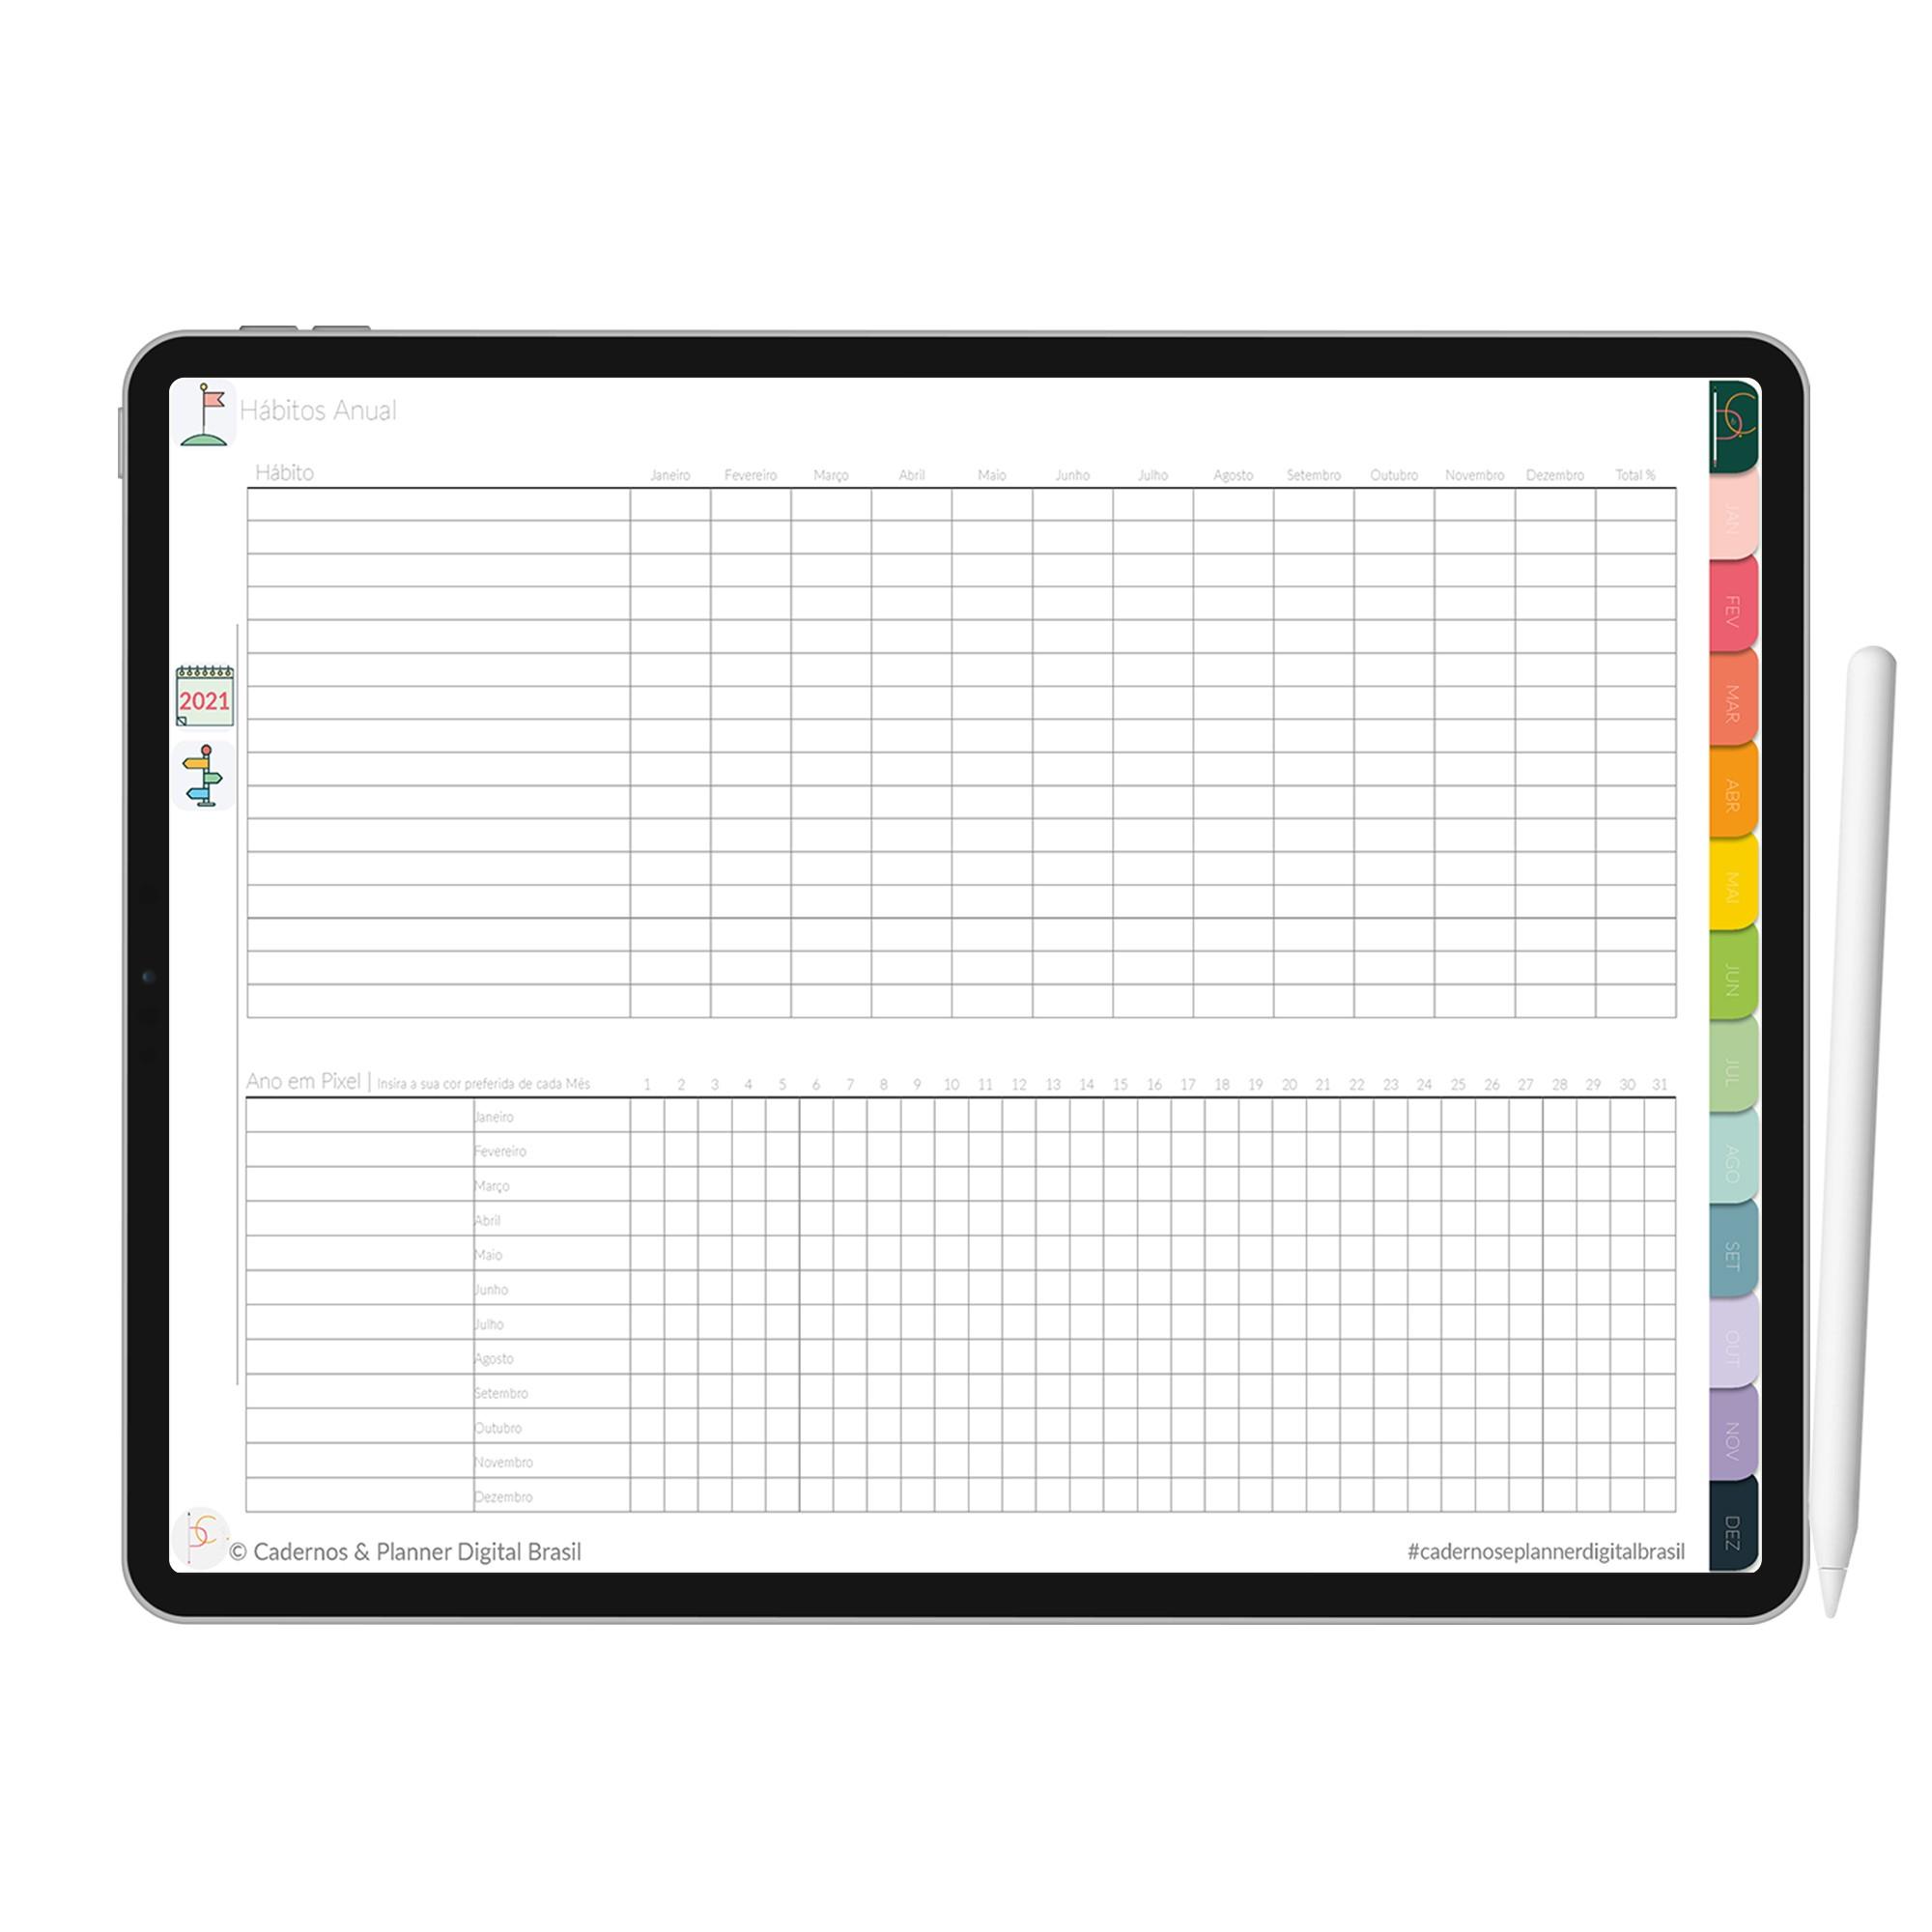 Planner Digital Anual | Planejamento da Vida | Rosa Nude | iPad Tablet | Download Instantâneo